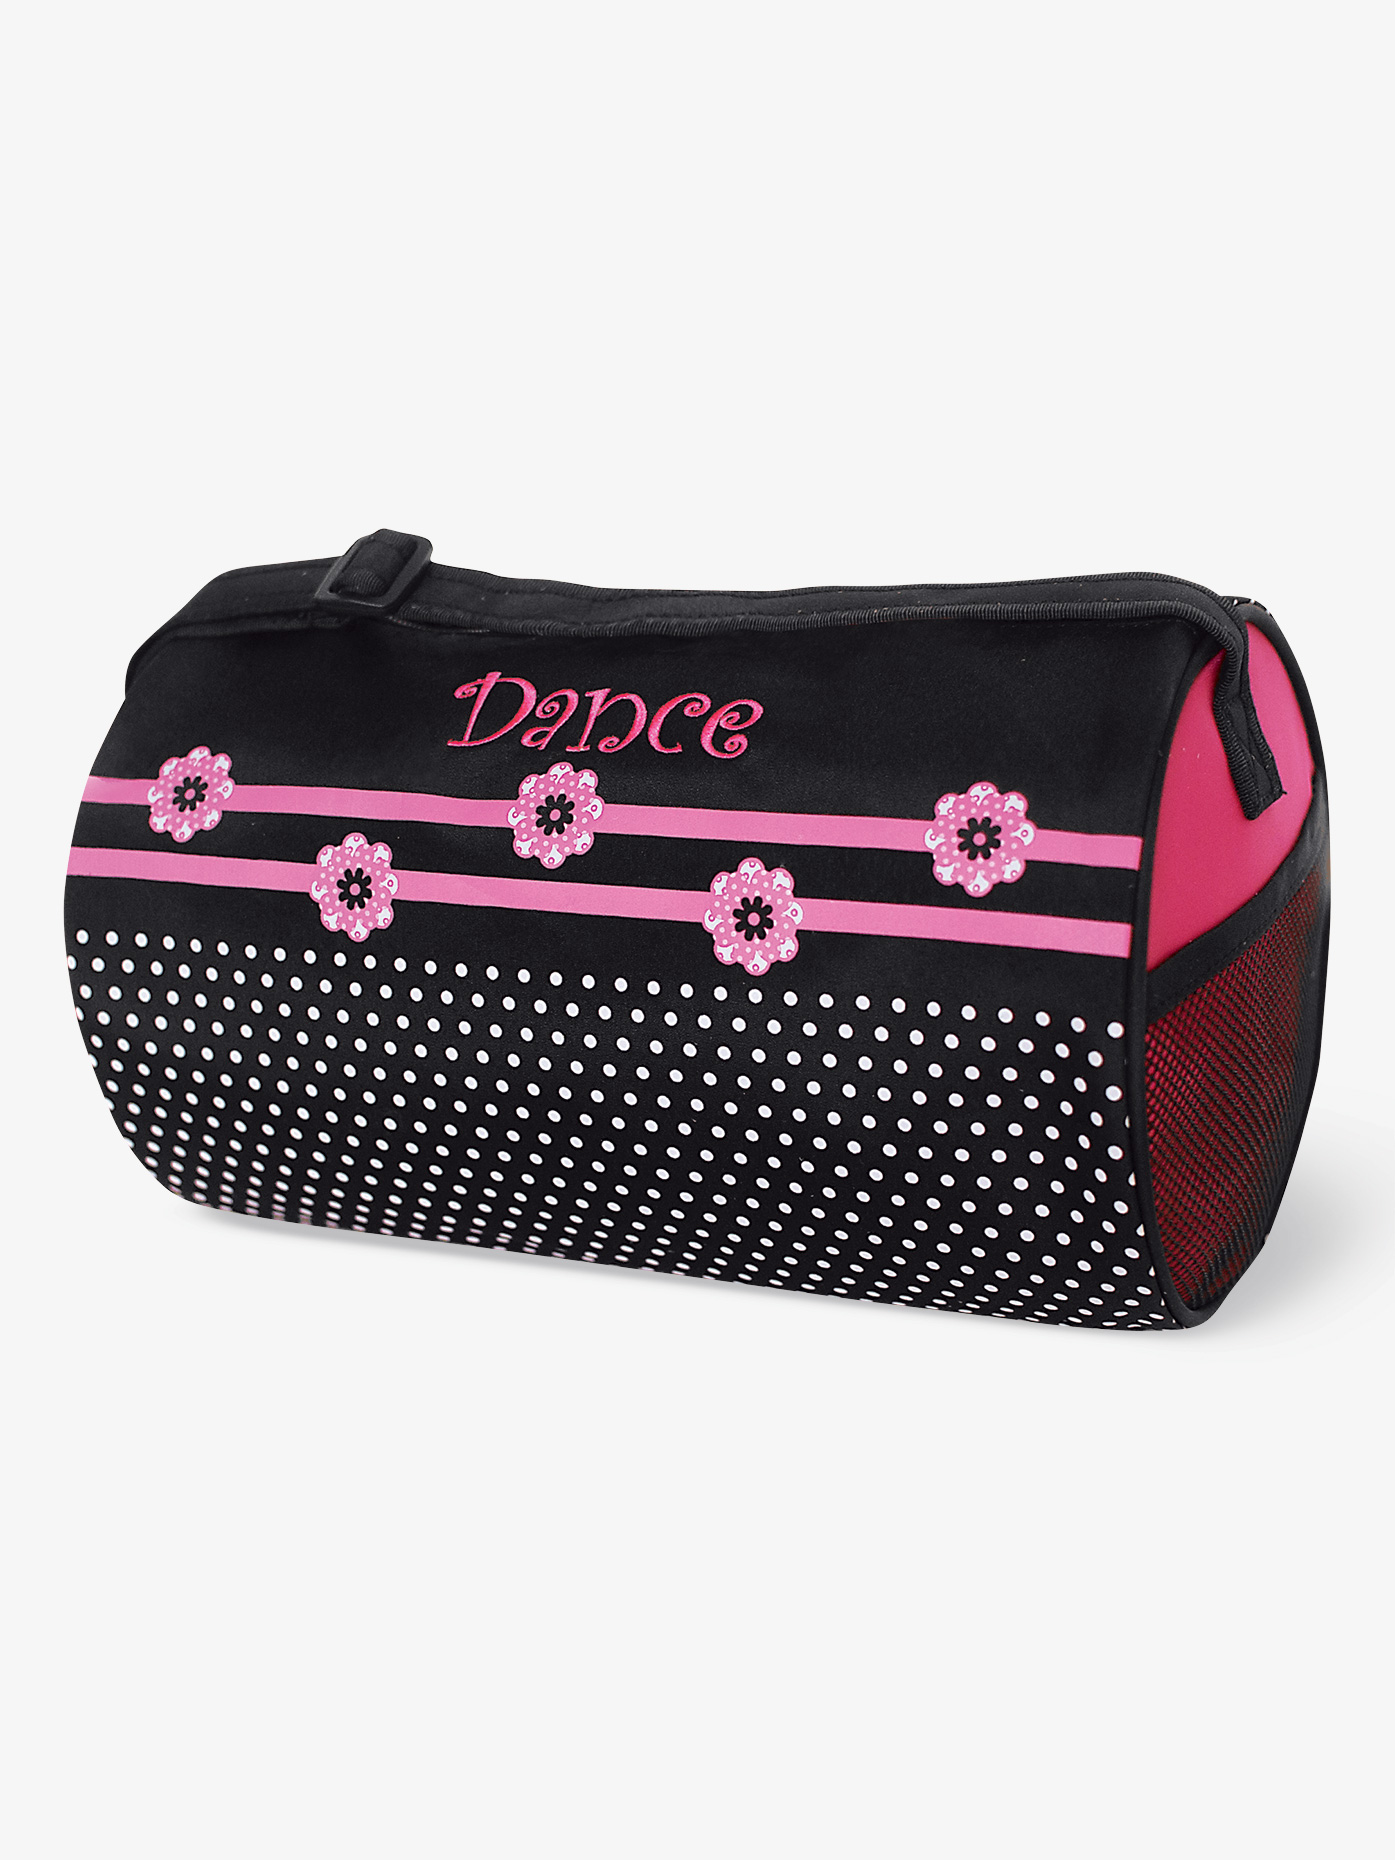 Sassi Flowers n Dots Dance Duffle Bag FDT02